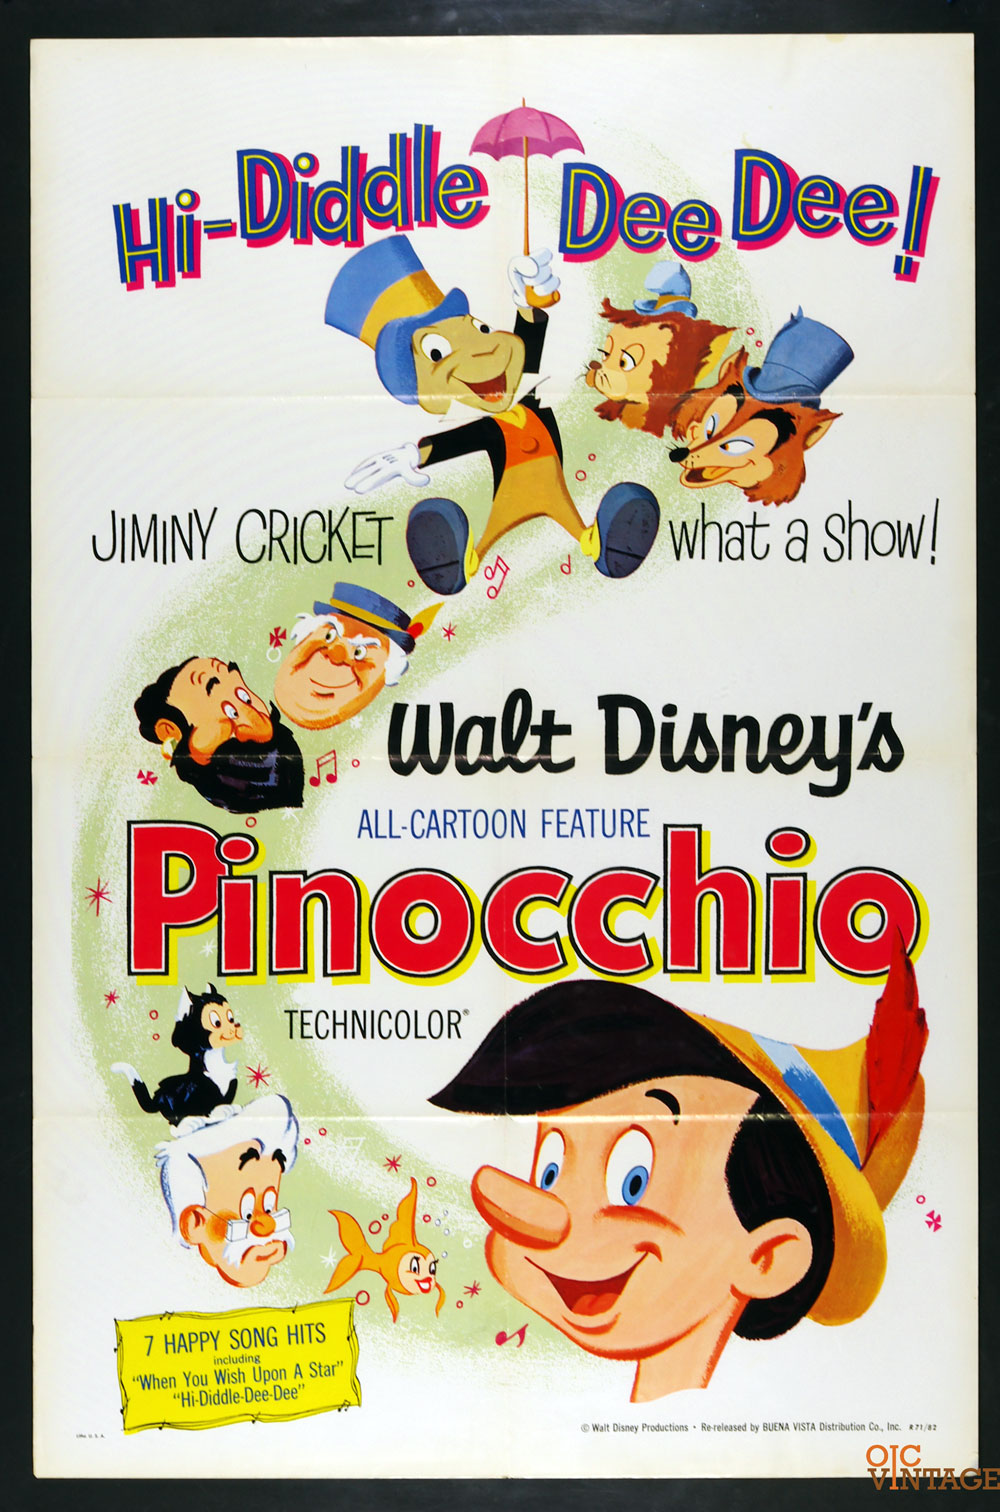 Pinocchio Movie Poster R1971 26 x 39 1 Sheet